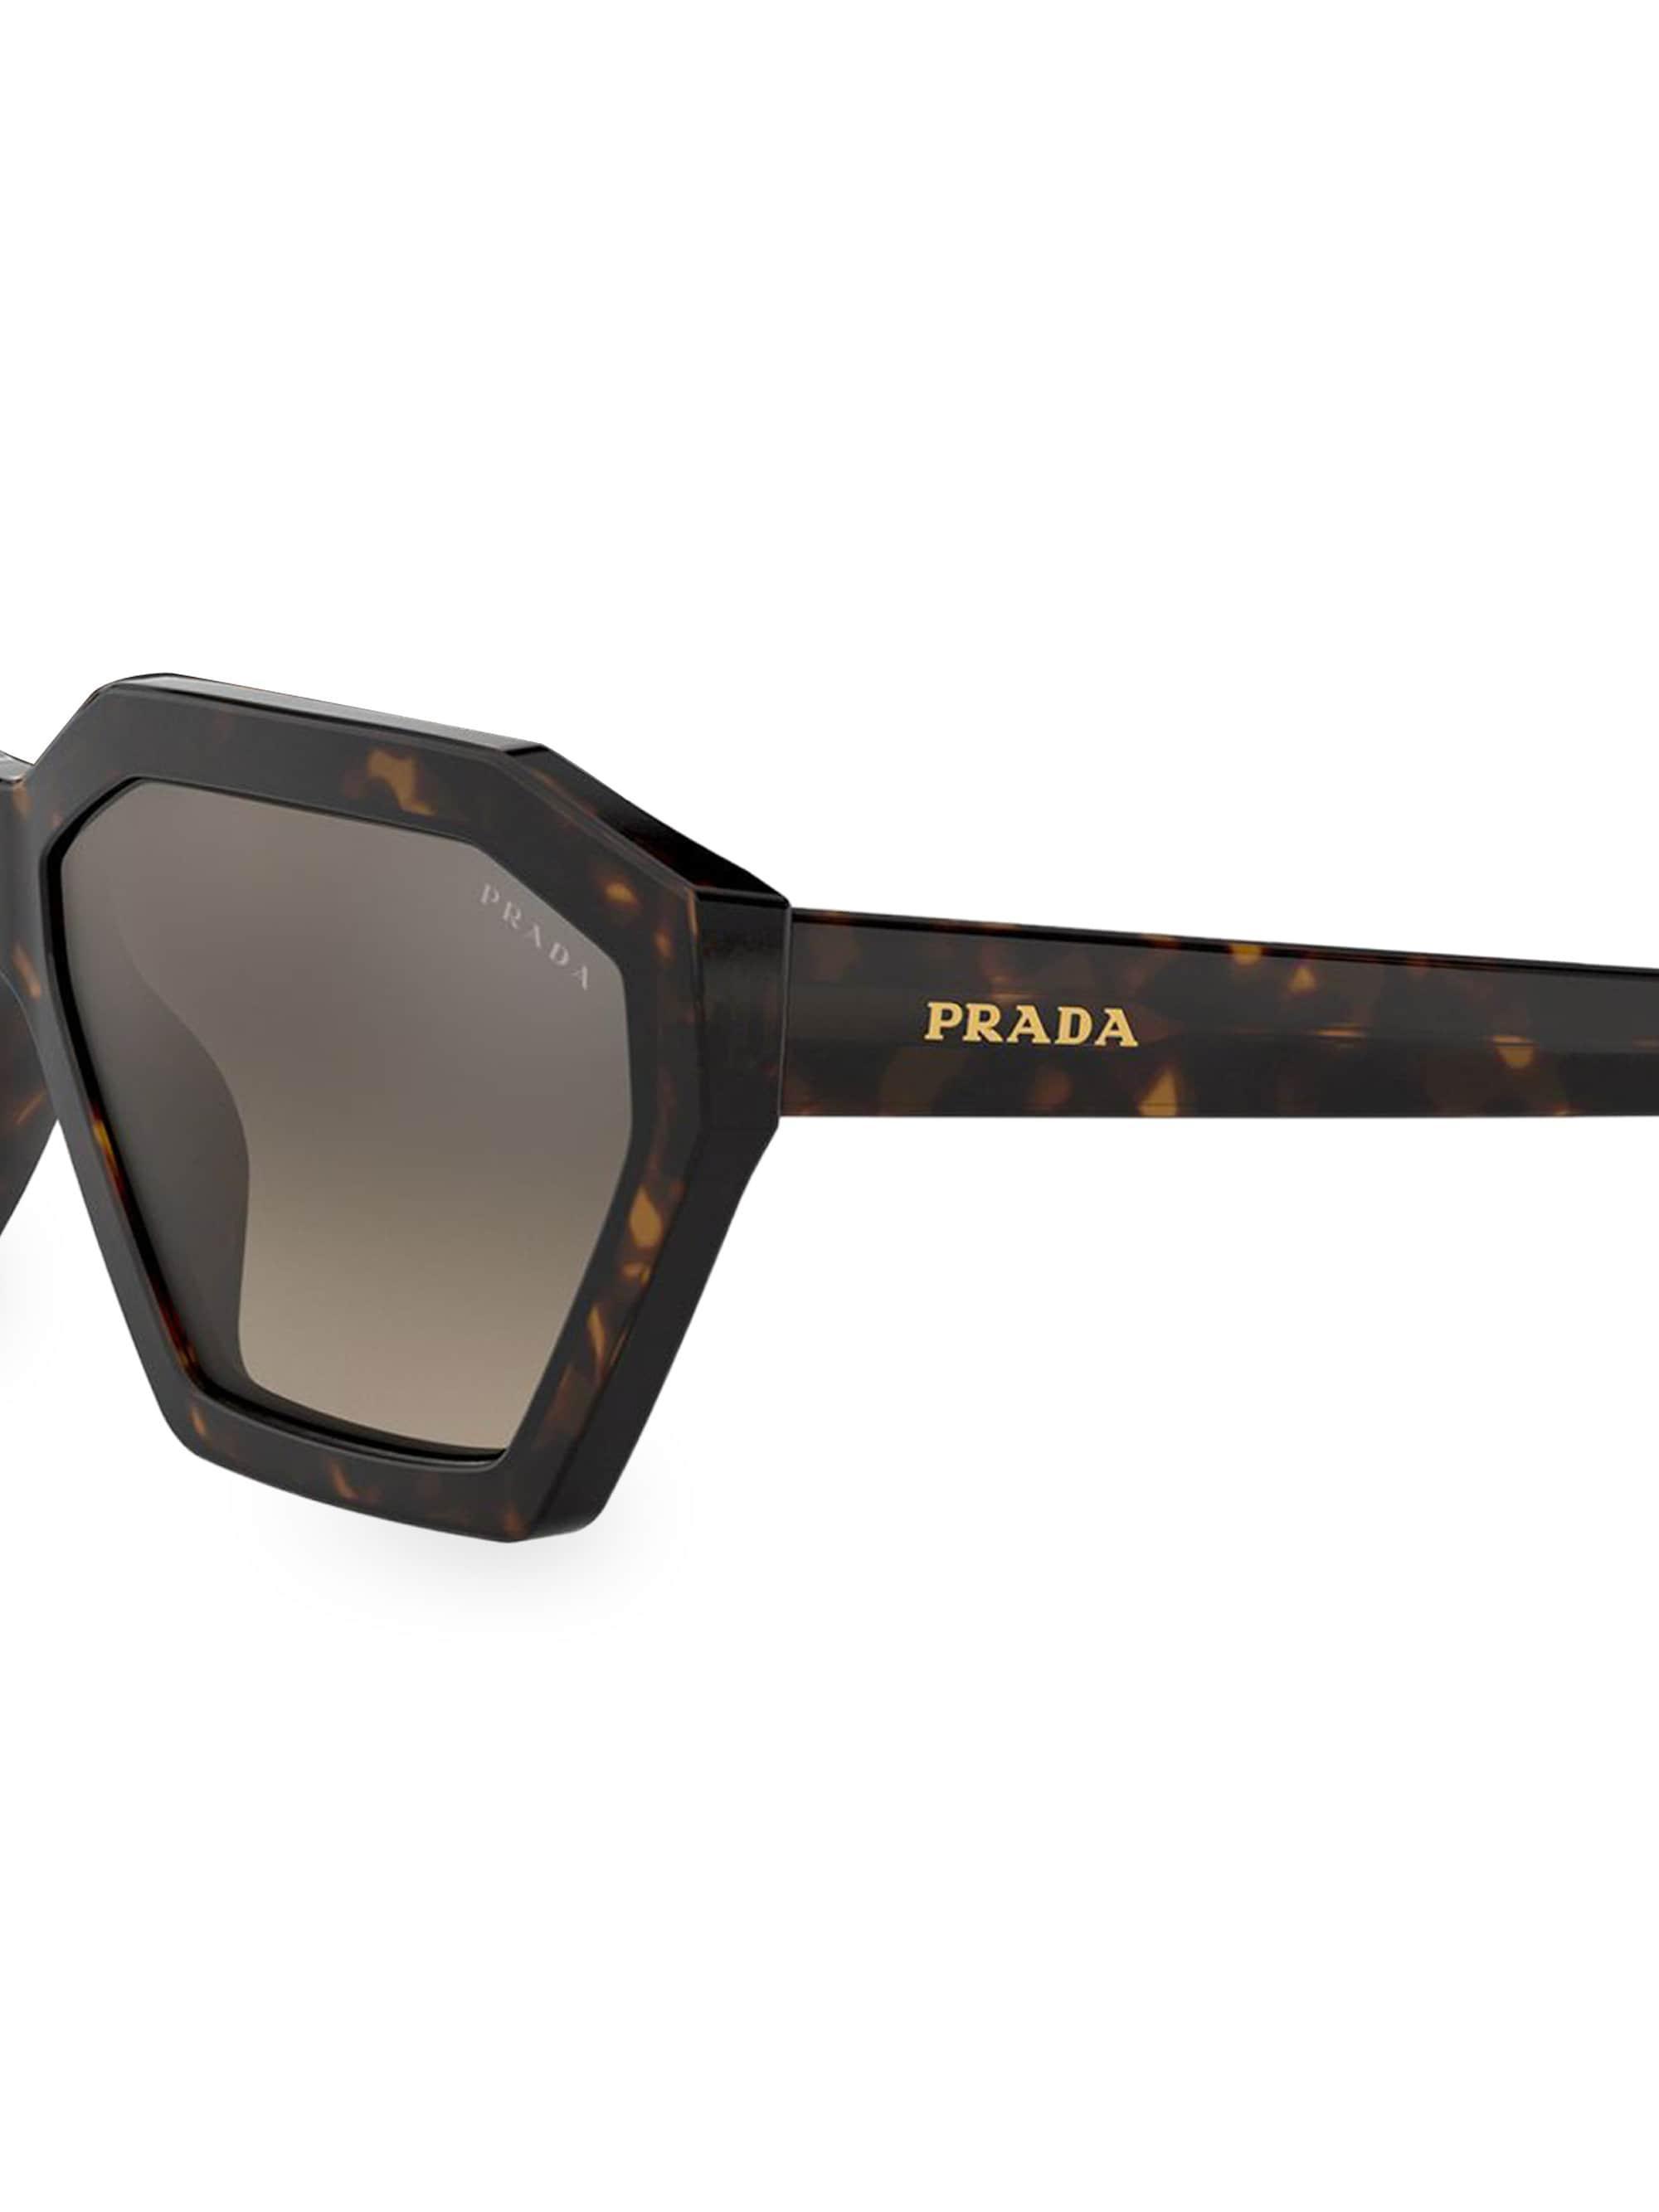 29d7763924528 Lyst - Prada 57mm Hexagon Tortoiseshell Sunglasses in Brown